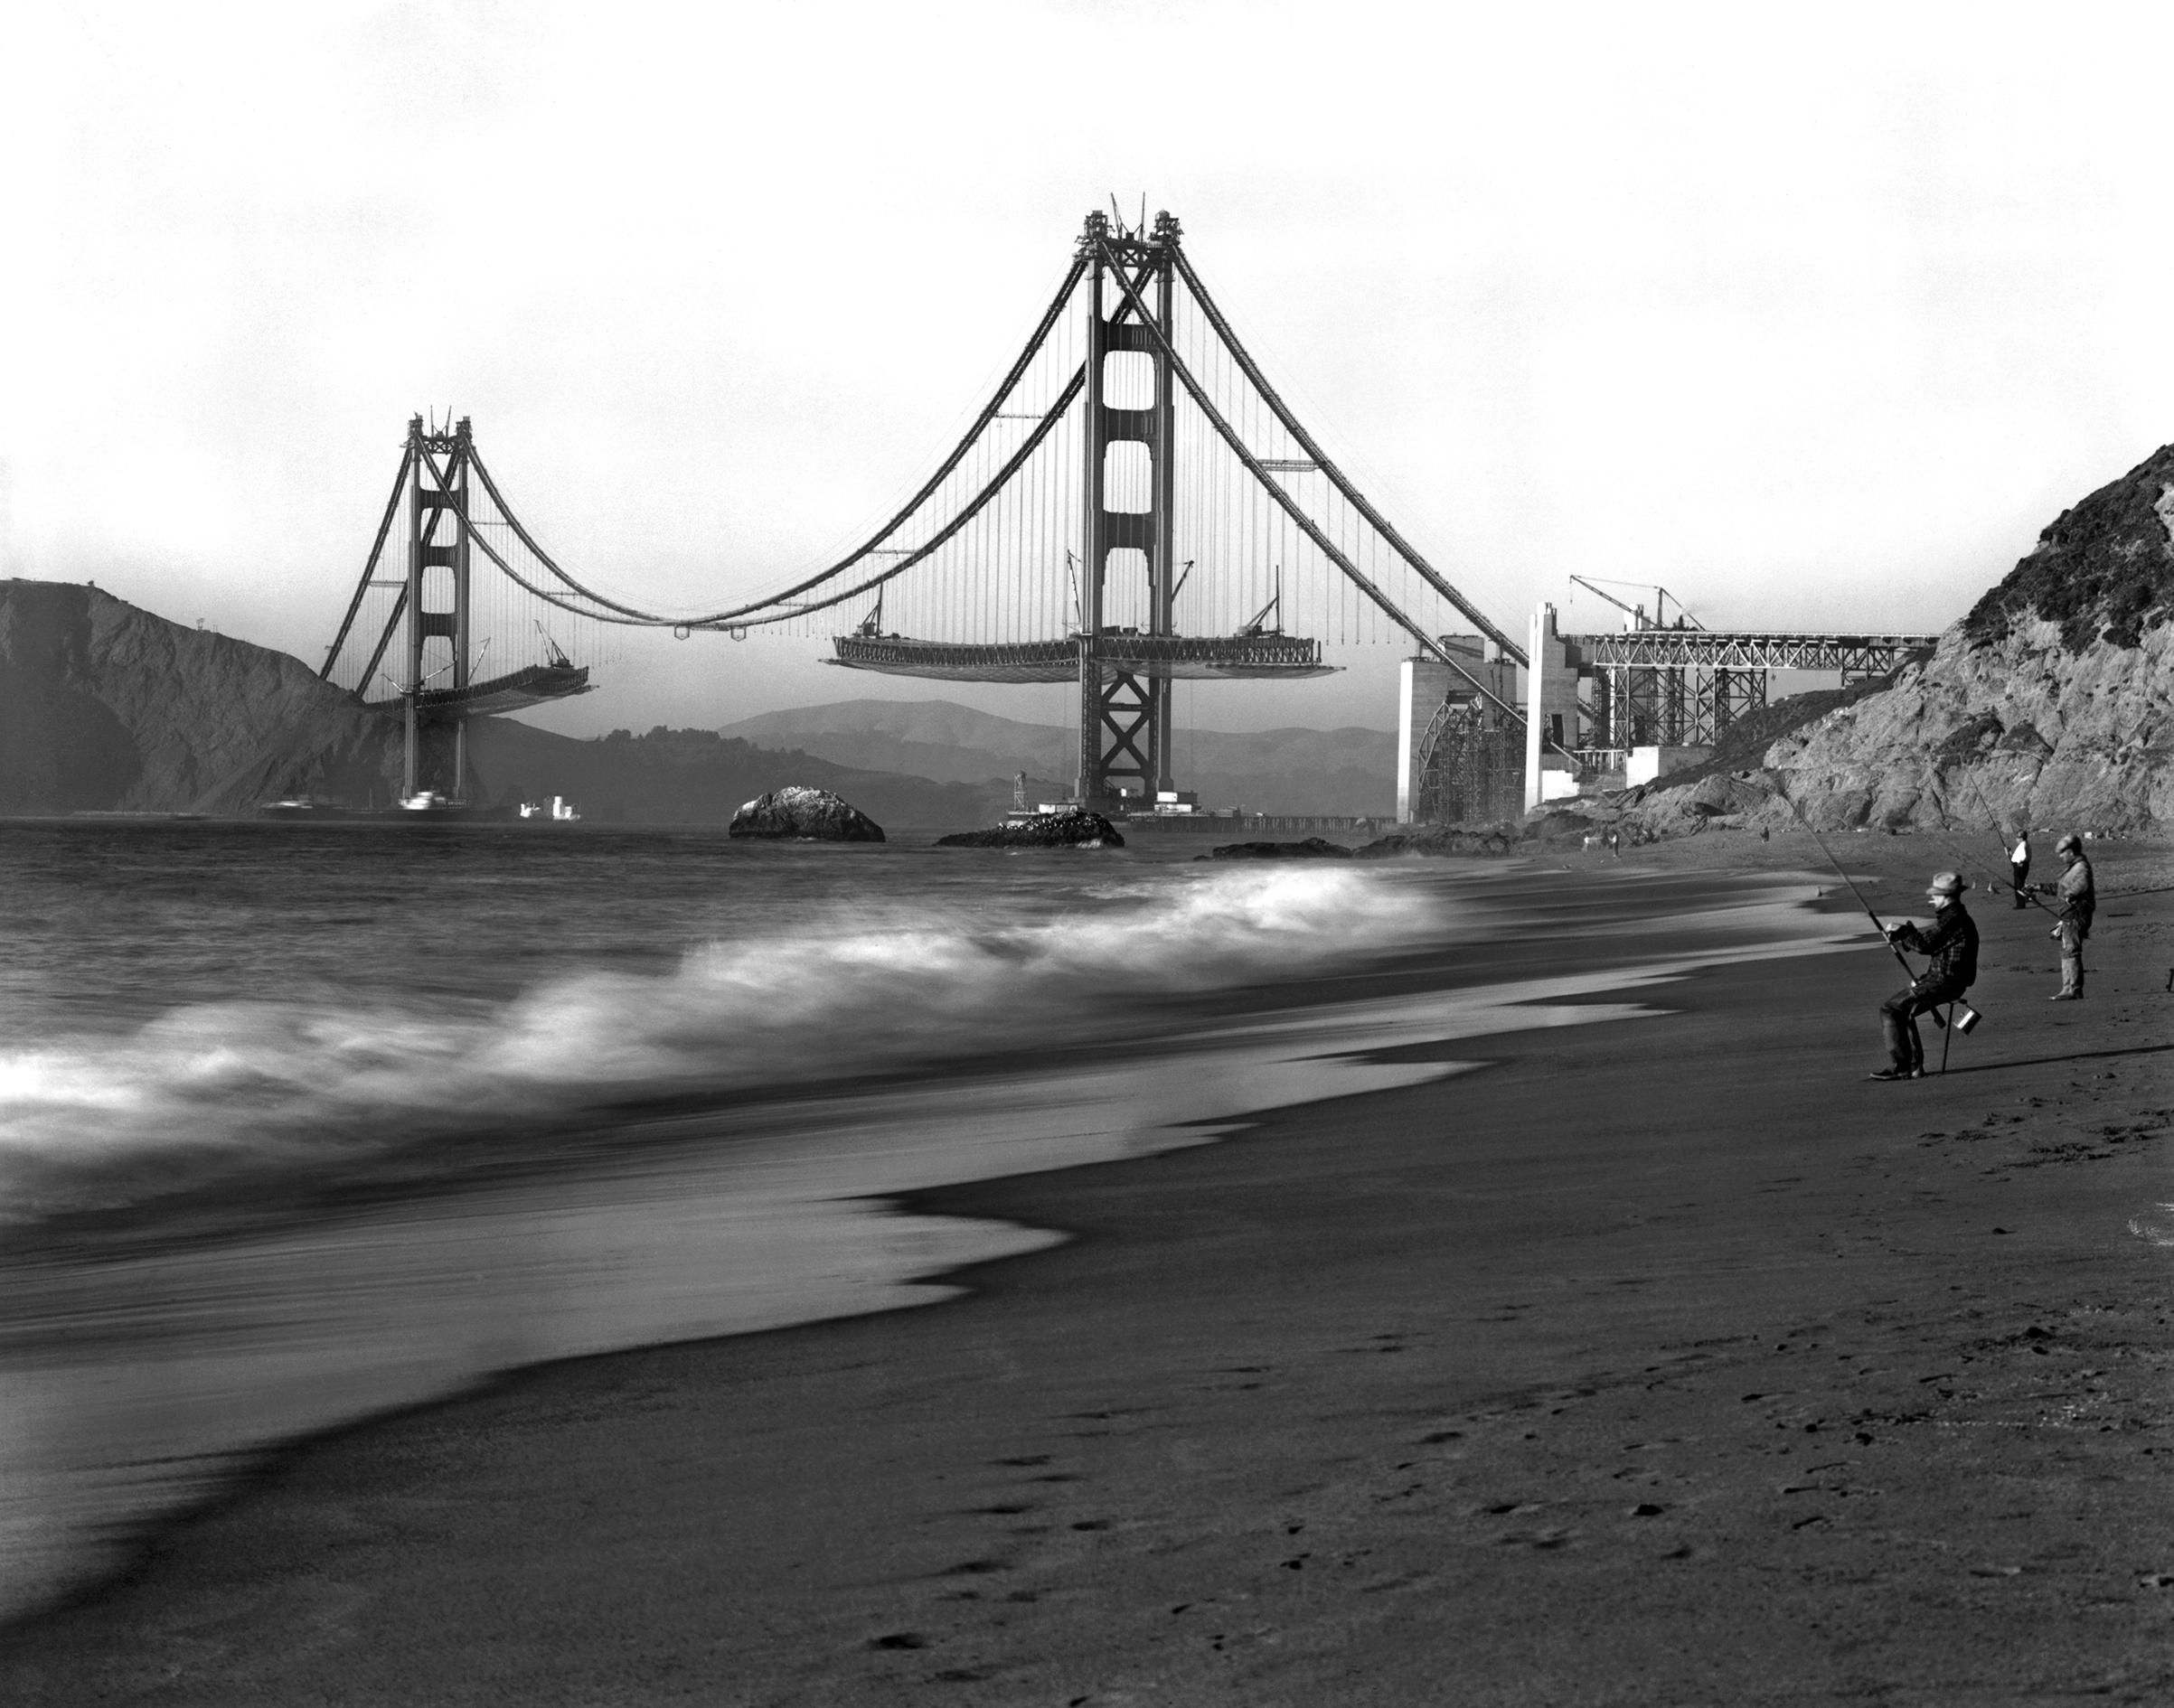 Fishermen on Baker Beach enjoy the view of the Golden Gate Bridge under construction, San Francisco, California, 1930s.